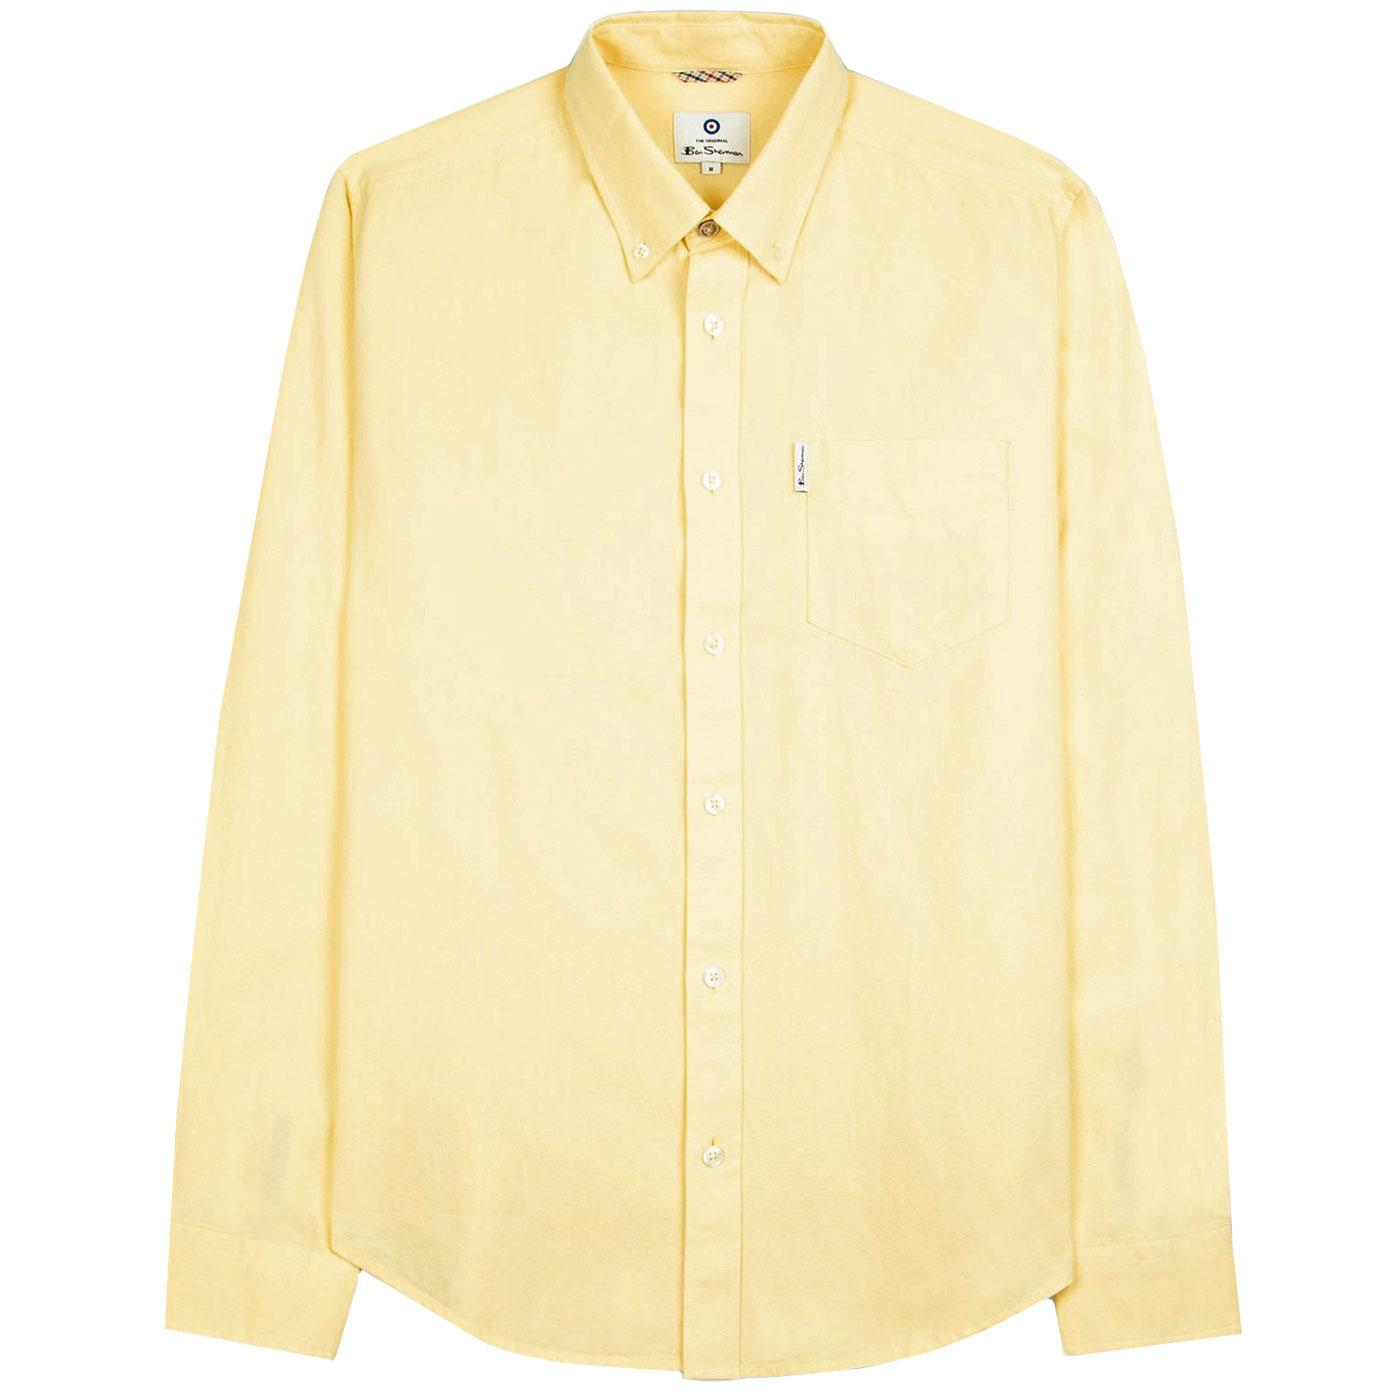 BEN SHERMAN Mod LS Signature Oxford Shirt (Yellow)